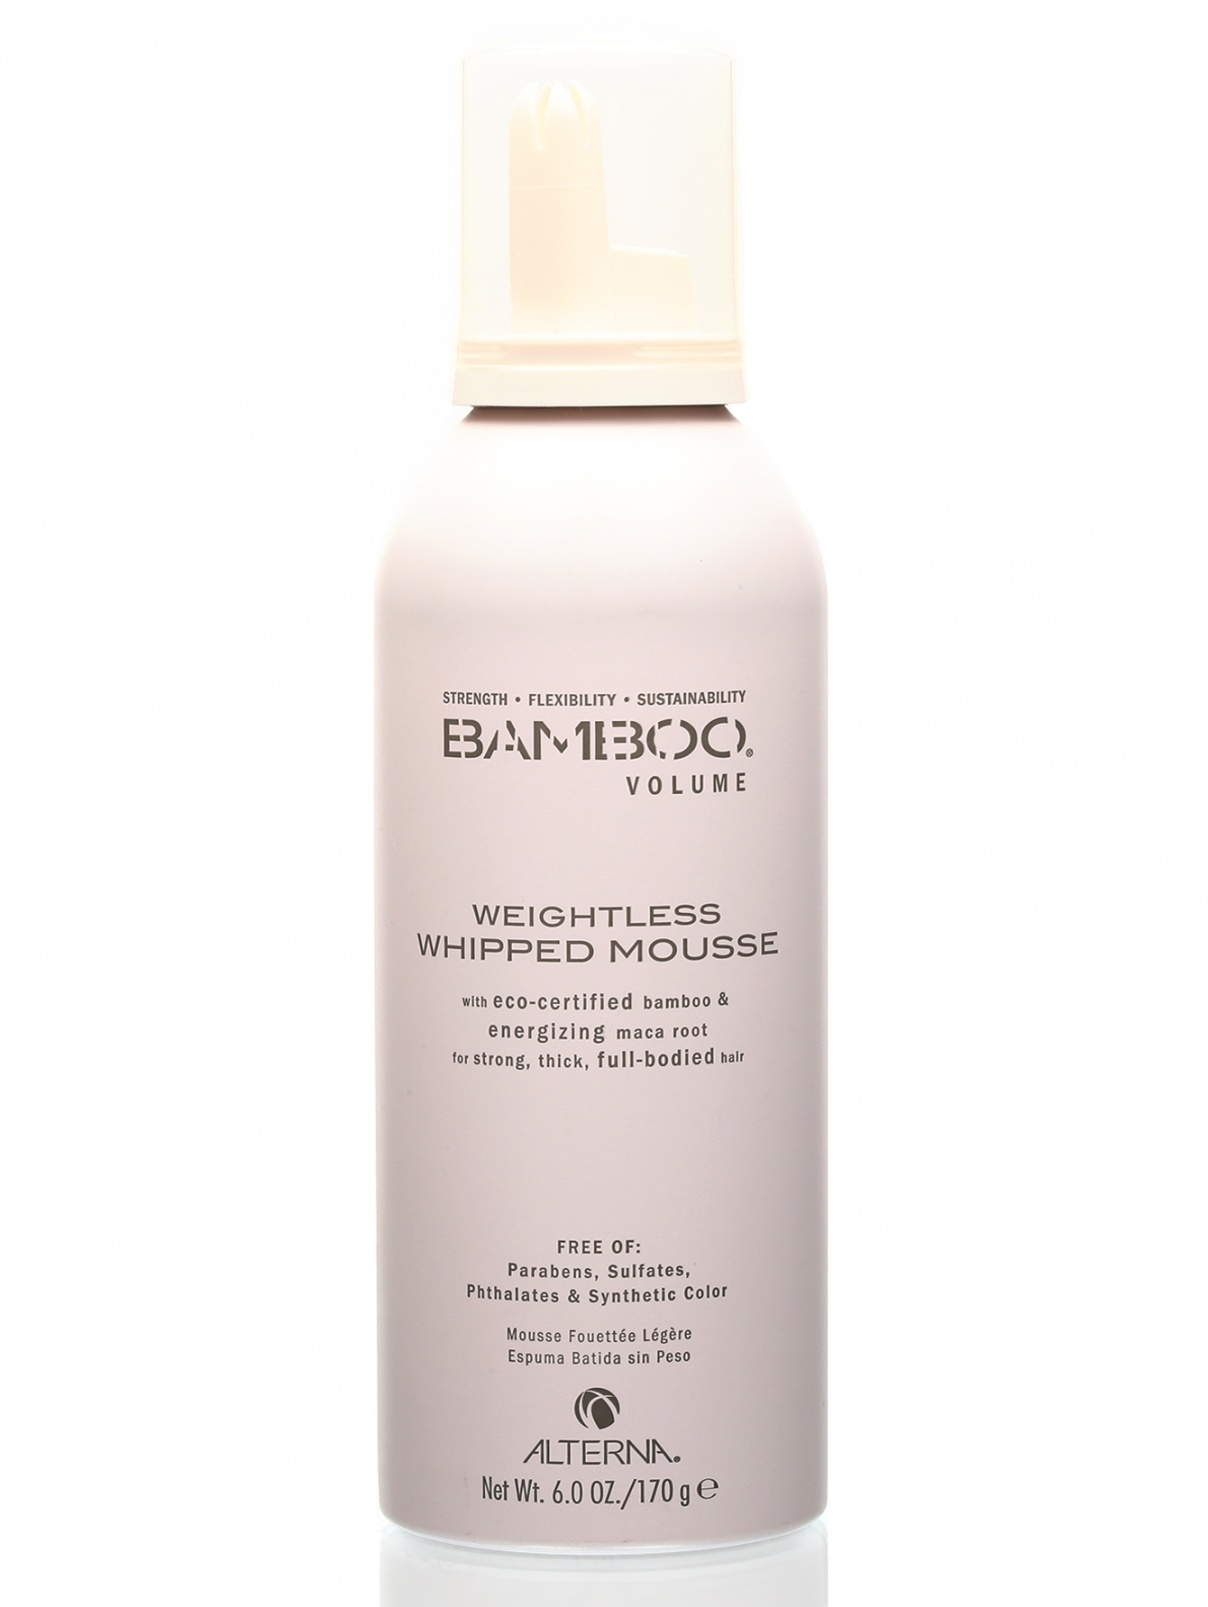 Невесомый мусс для объема - Bamboo, Hair Care ALTERNA  –  Общий вид